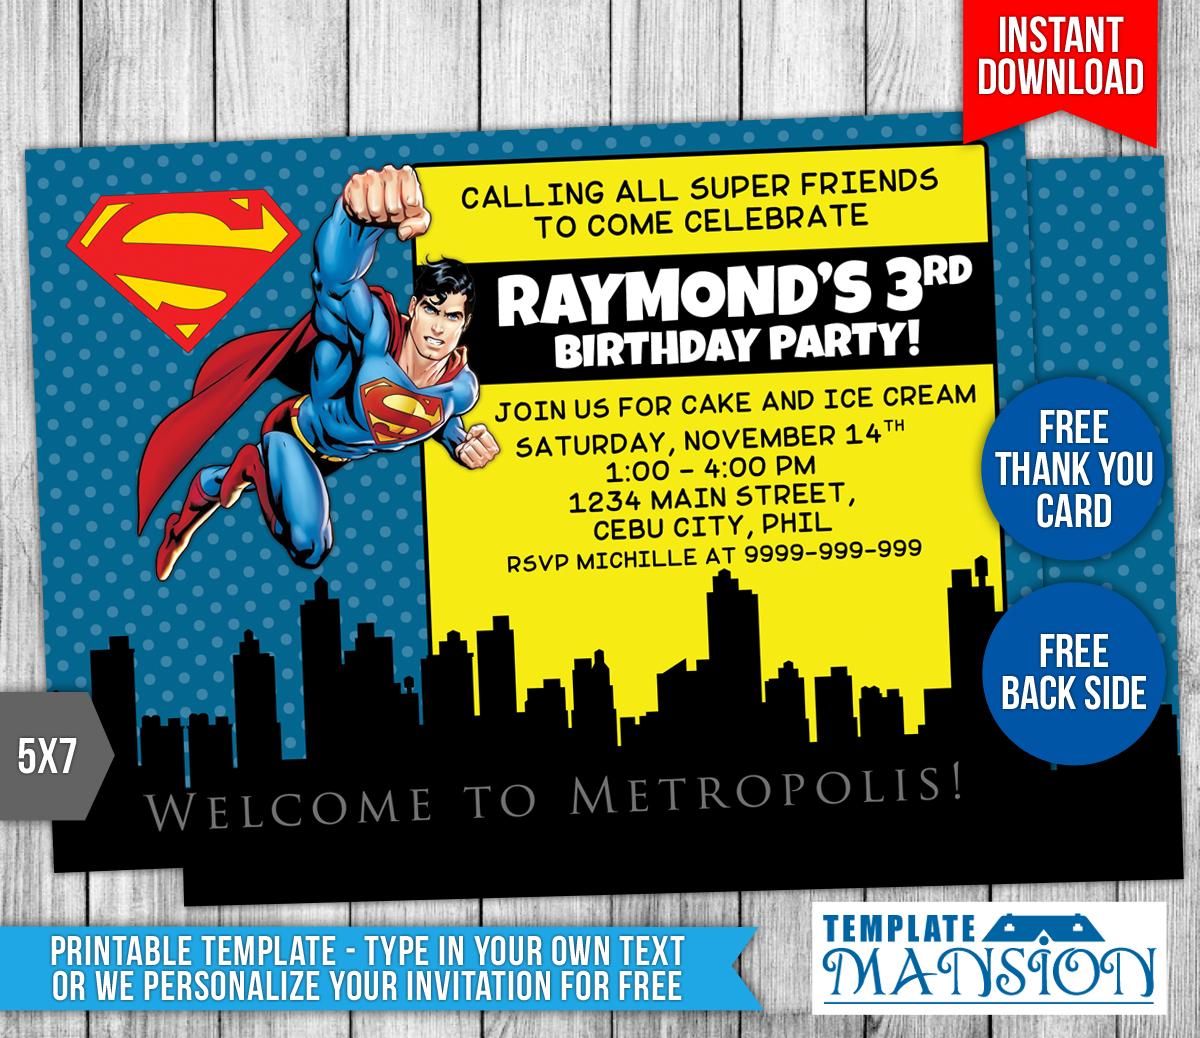 Superman Birthday Invitation Template by templatemansion on DeviantArt Pertaining To Superman Birthday Card Template